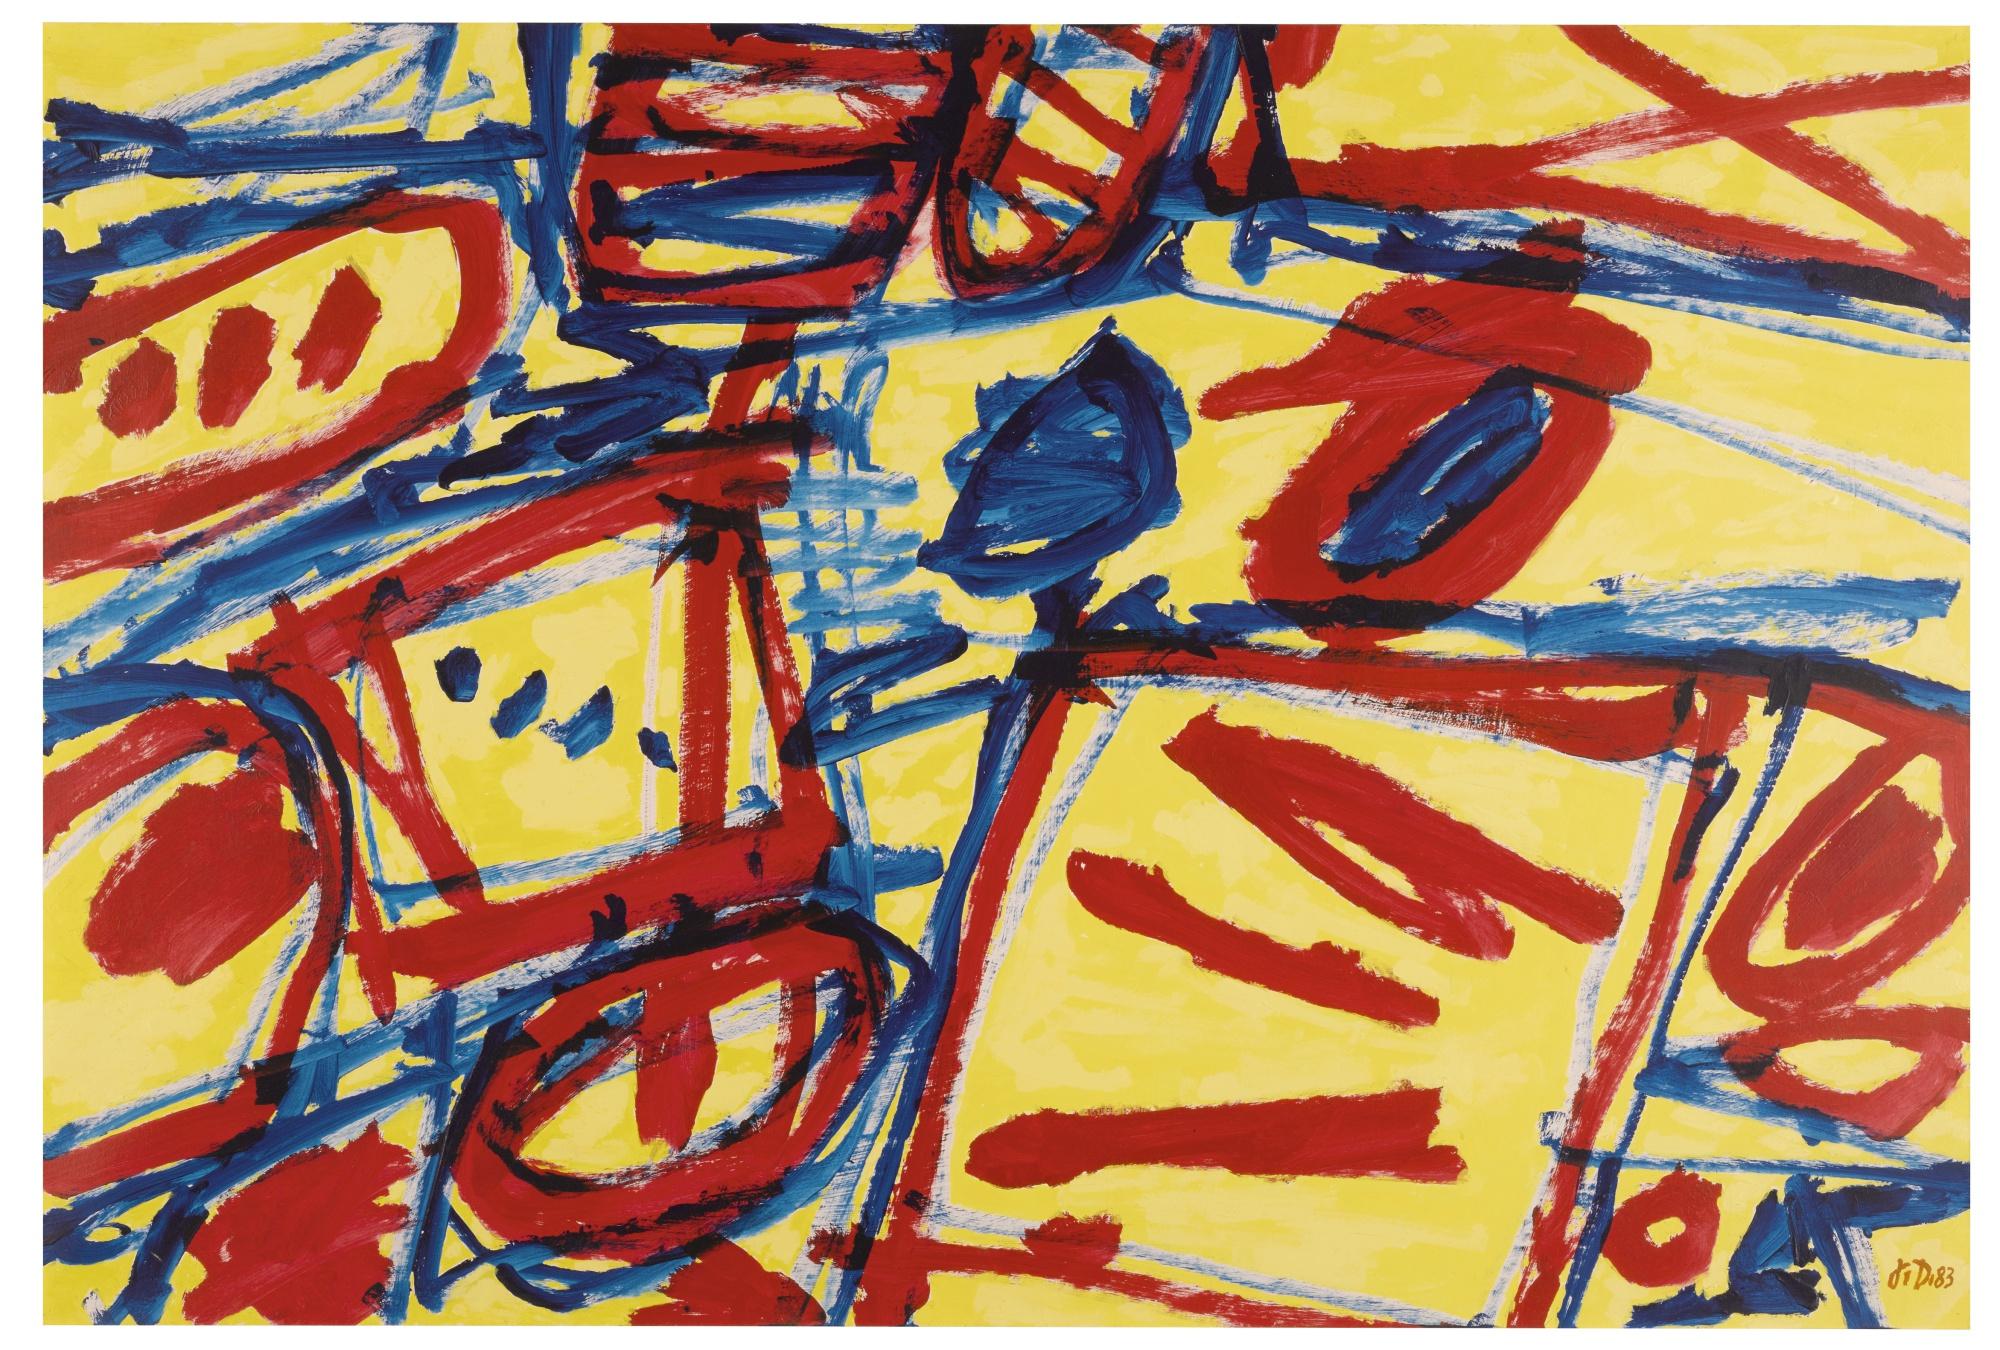 Jean Dubuffet-Mire G 128 (Kowloon)-1983